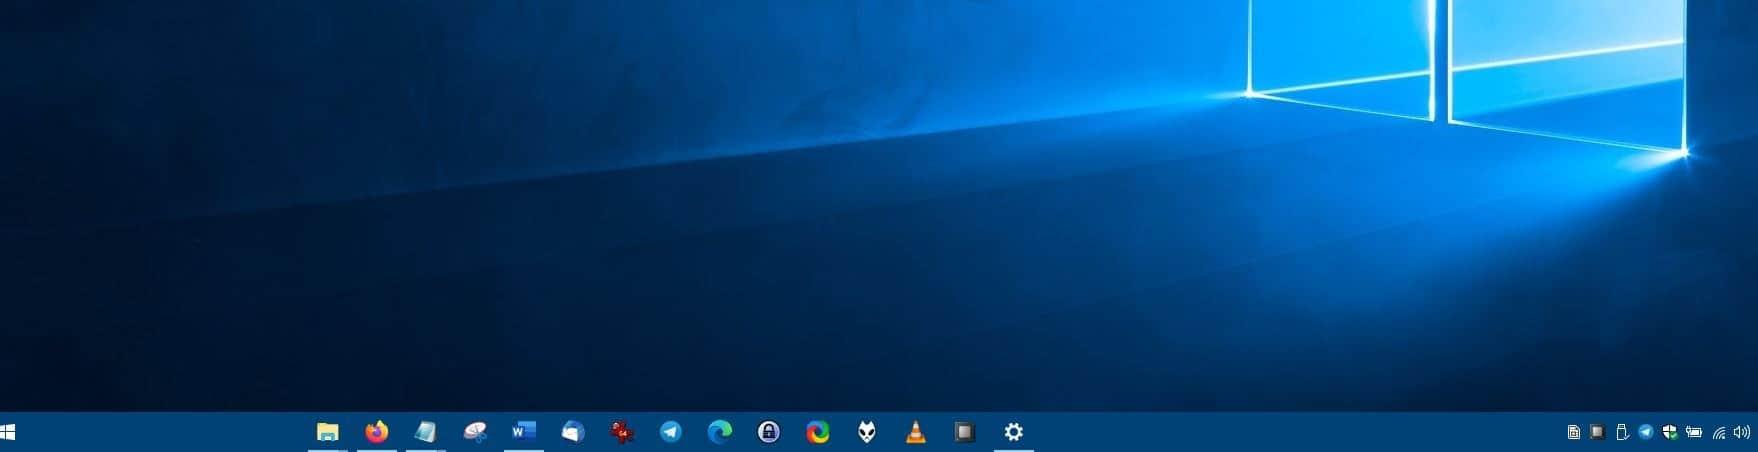 CenterTaskbar - after disabling second display